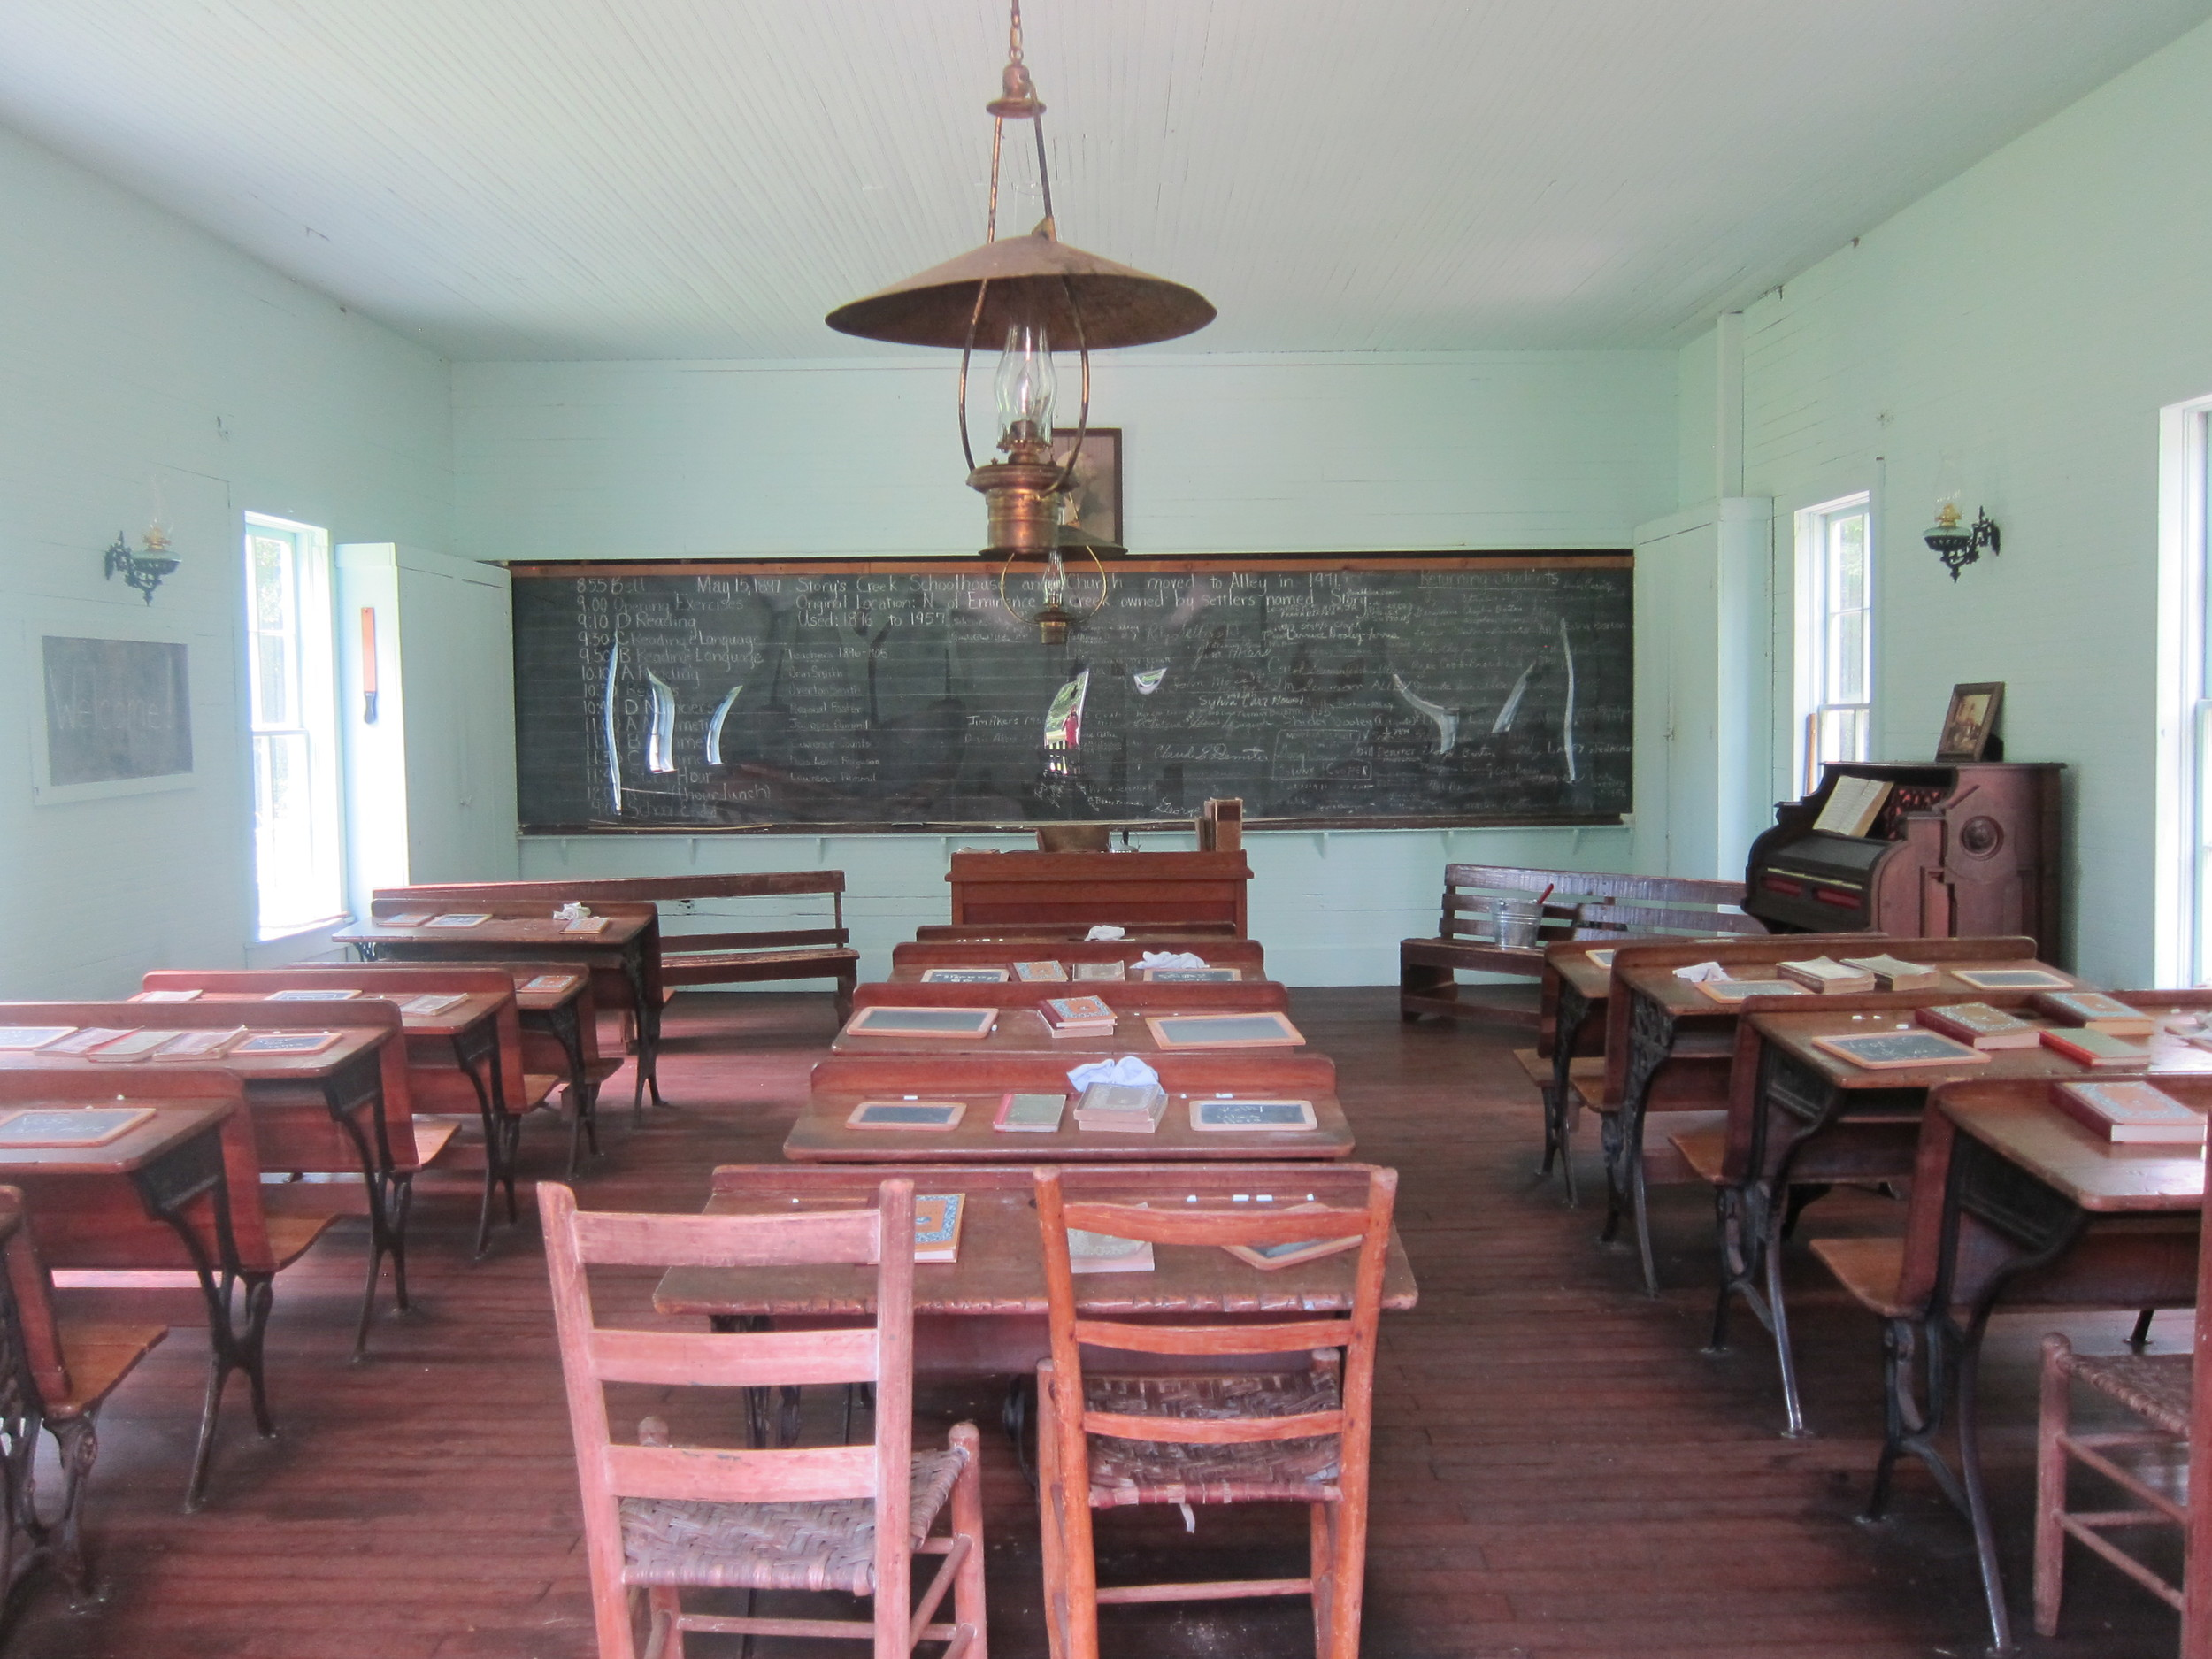 Historic Schoolhouse, Alley Spring MO